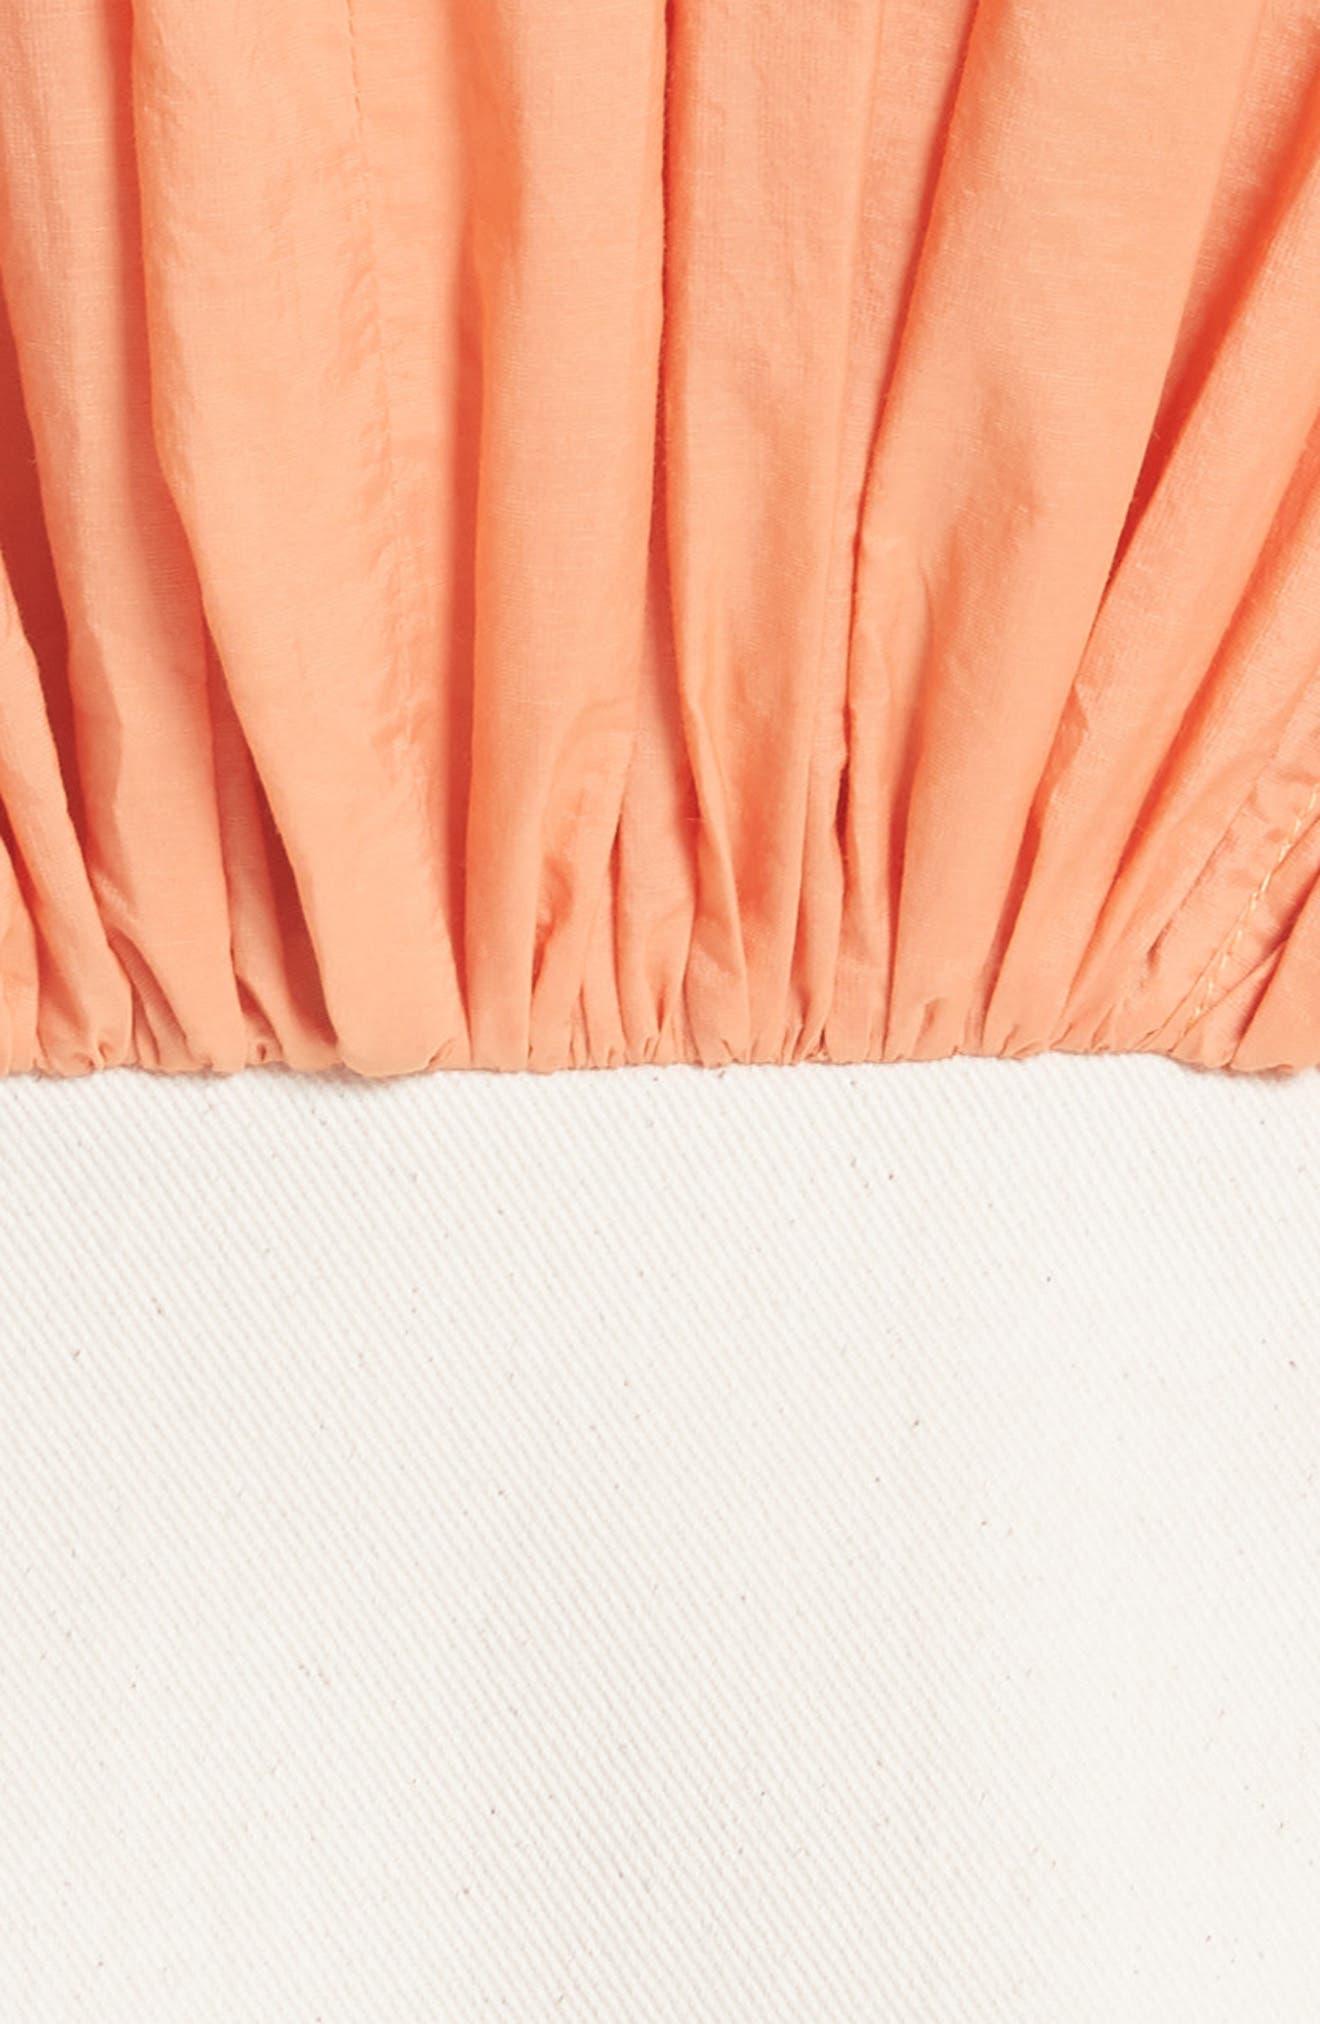 Yana Bicolor Dress,                             Alternate thumbnail 5, color,                             Cotton Orange/ Denim Ecru